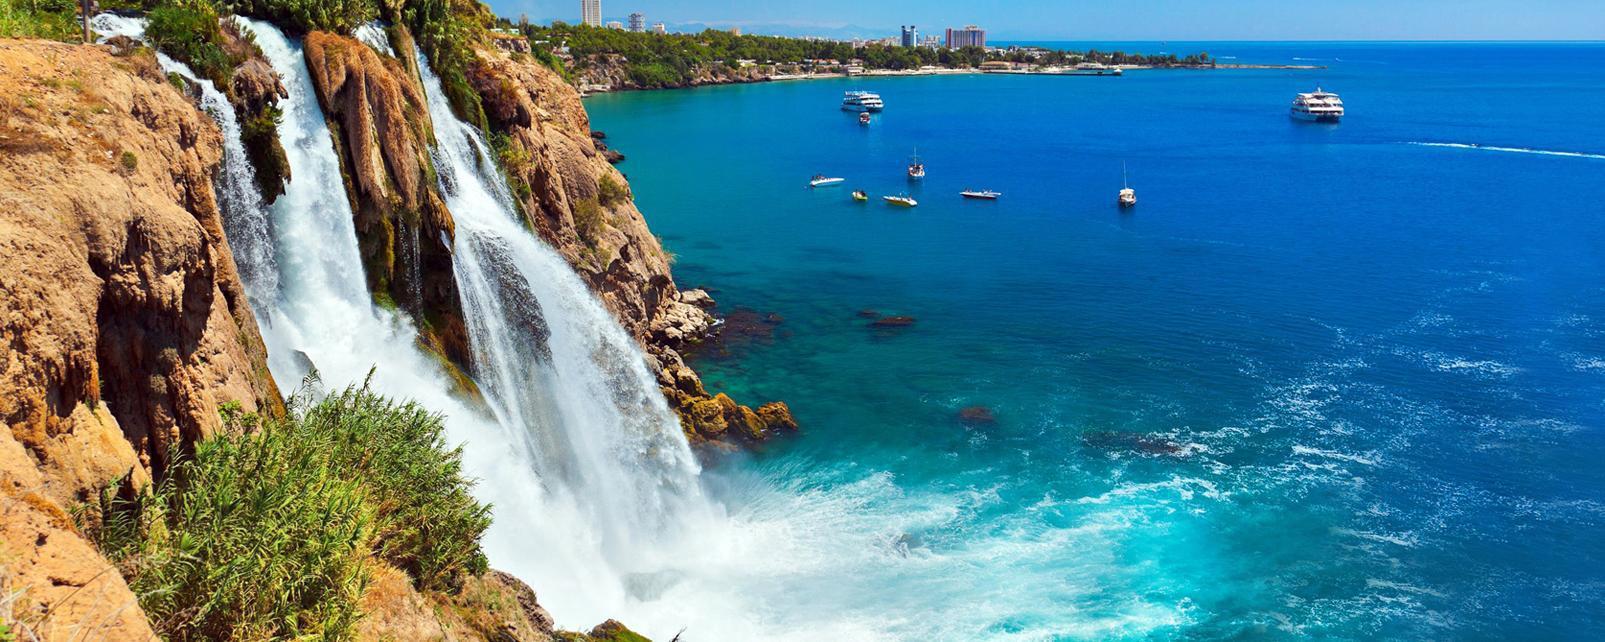 Asie, Europe, Moyen-Orient, Turquie, Antalya, cascade, Duden, mer, bateau, ville,